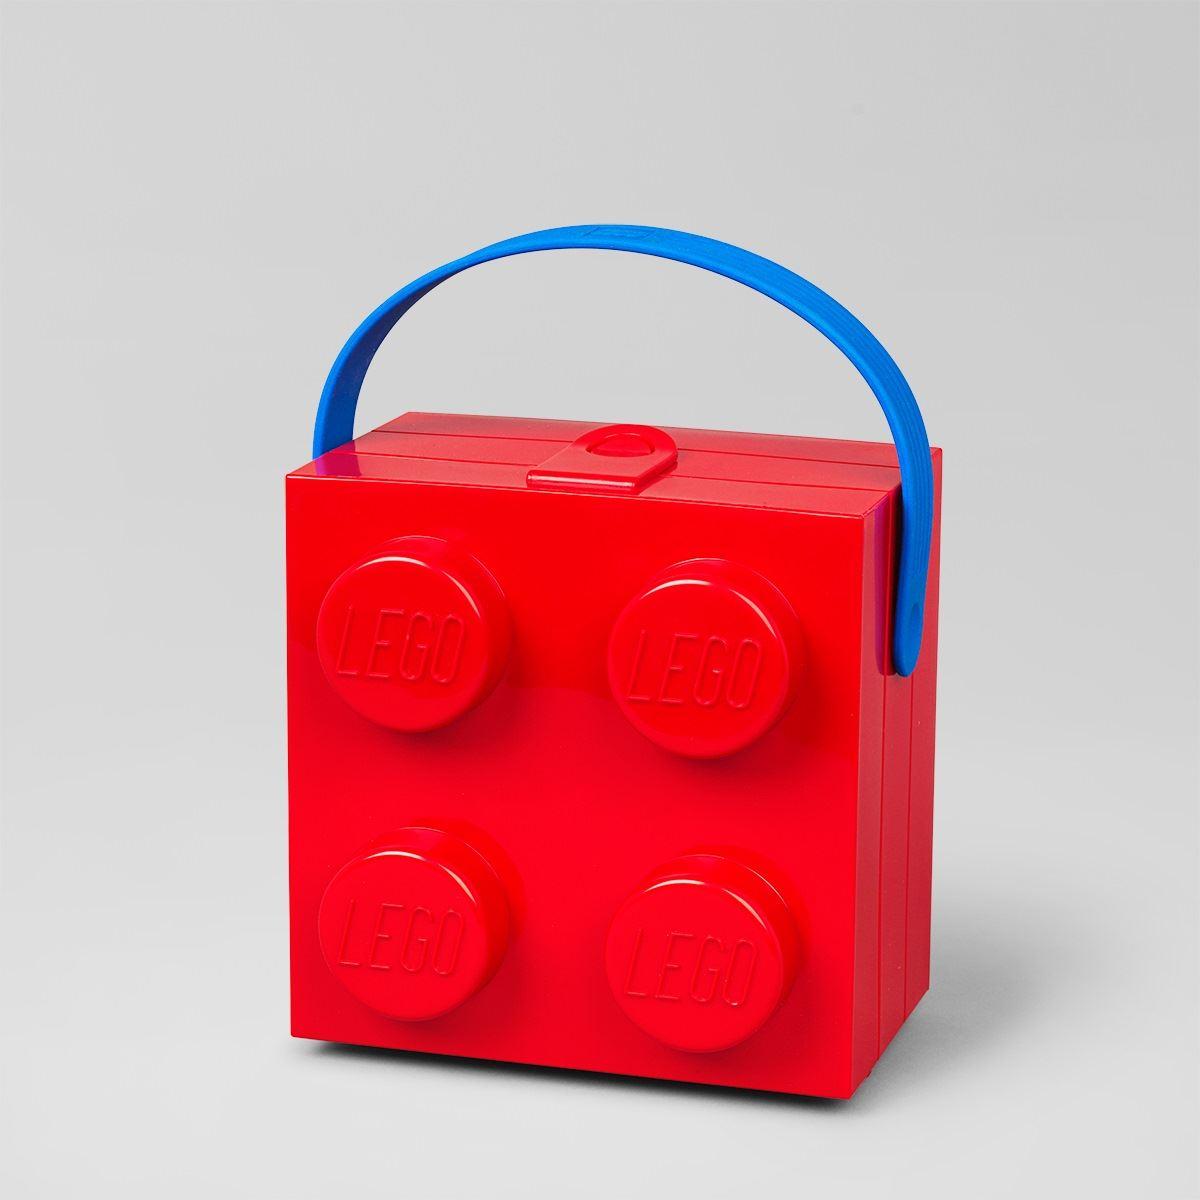 LEGO Lunch Box Classic Handle Rubber Plastic Kids School Portable | eBay